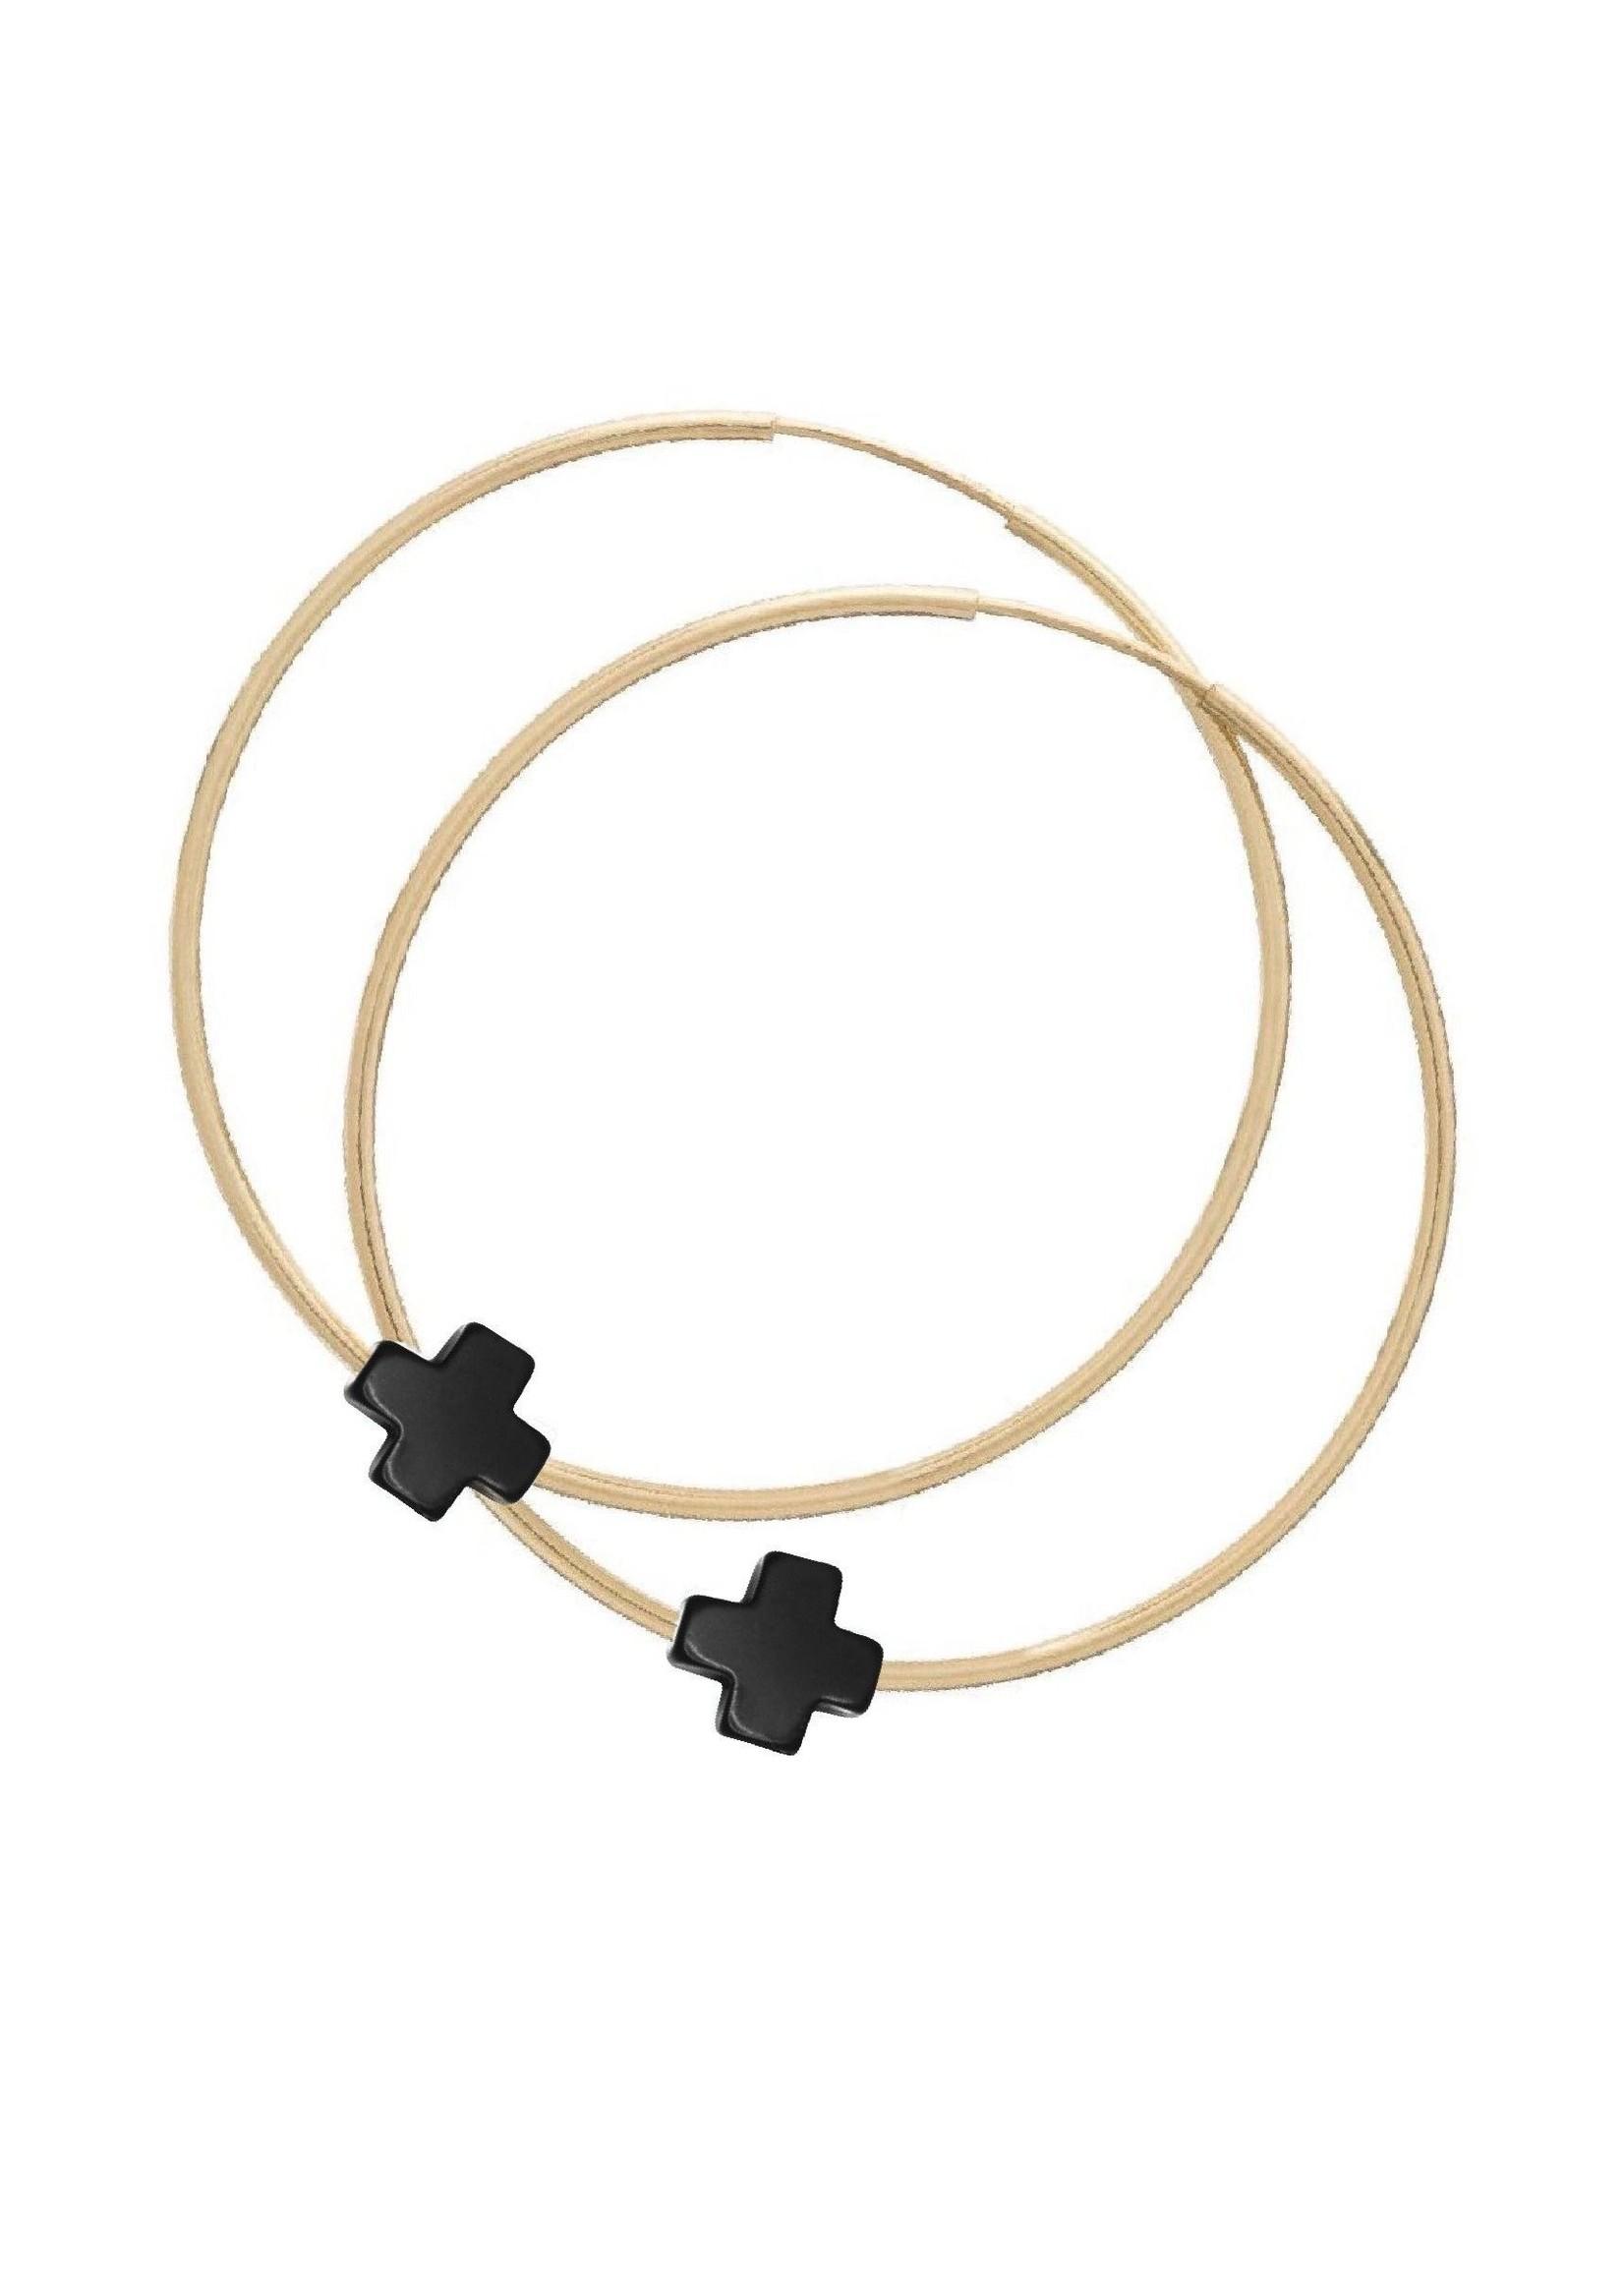 "enewton Endless Gold 1.75"" Hoop - Signature Cross - Charcoal"